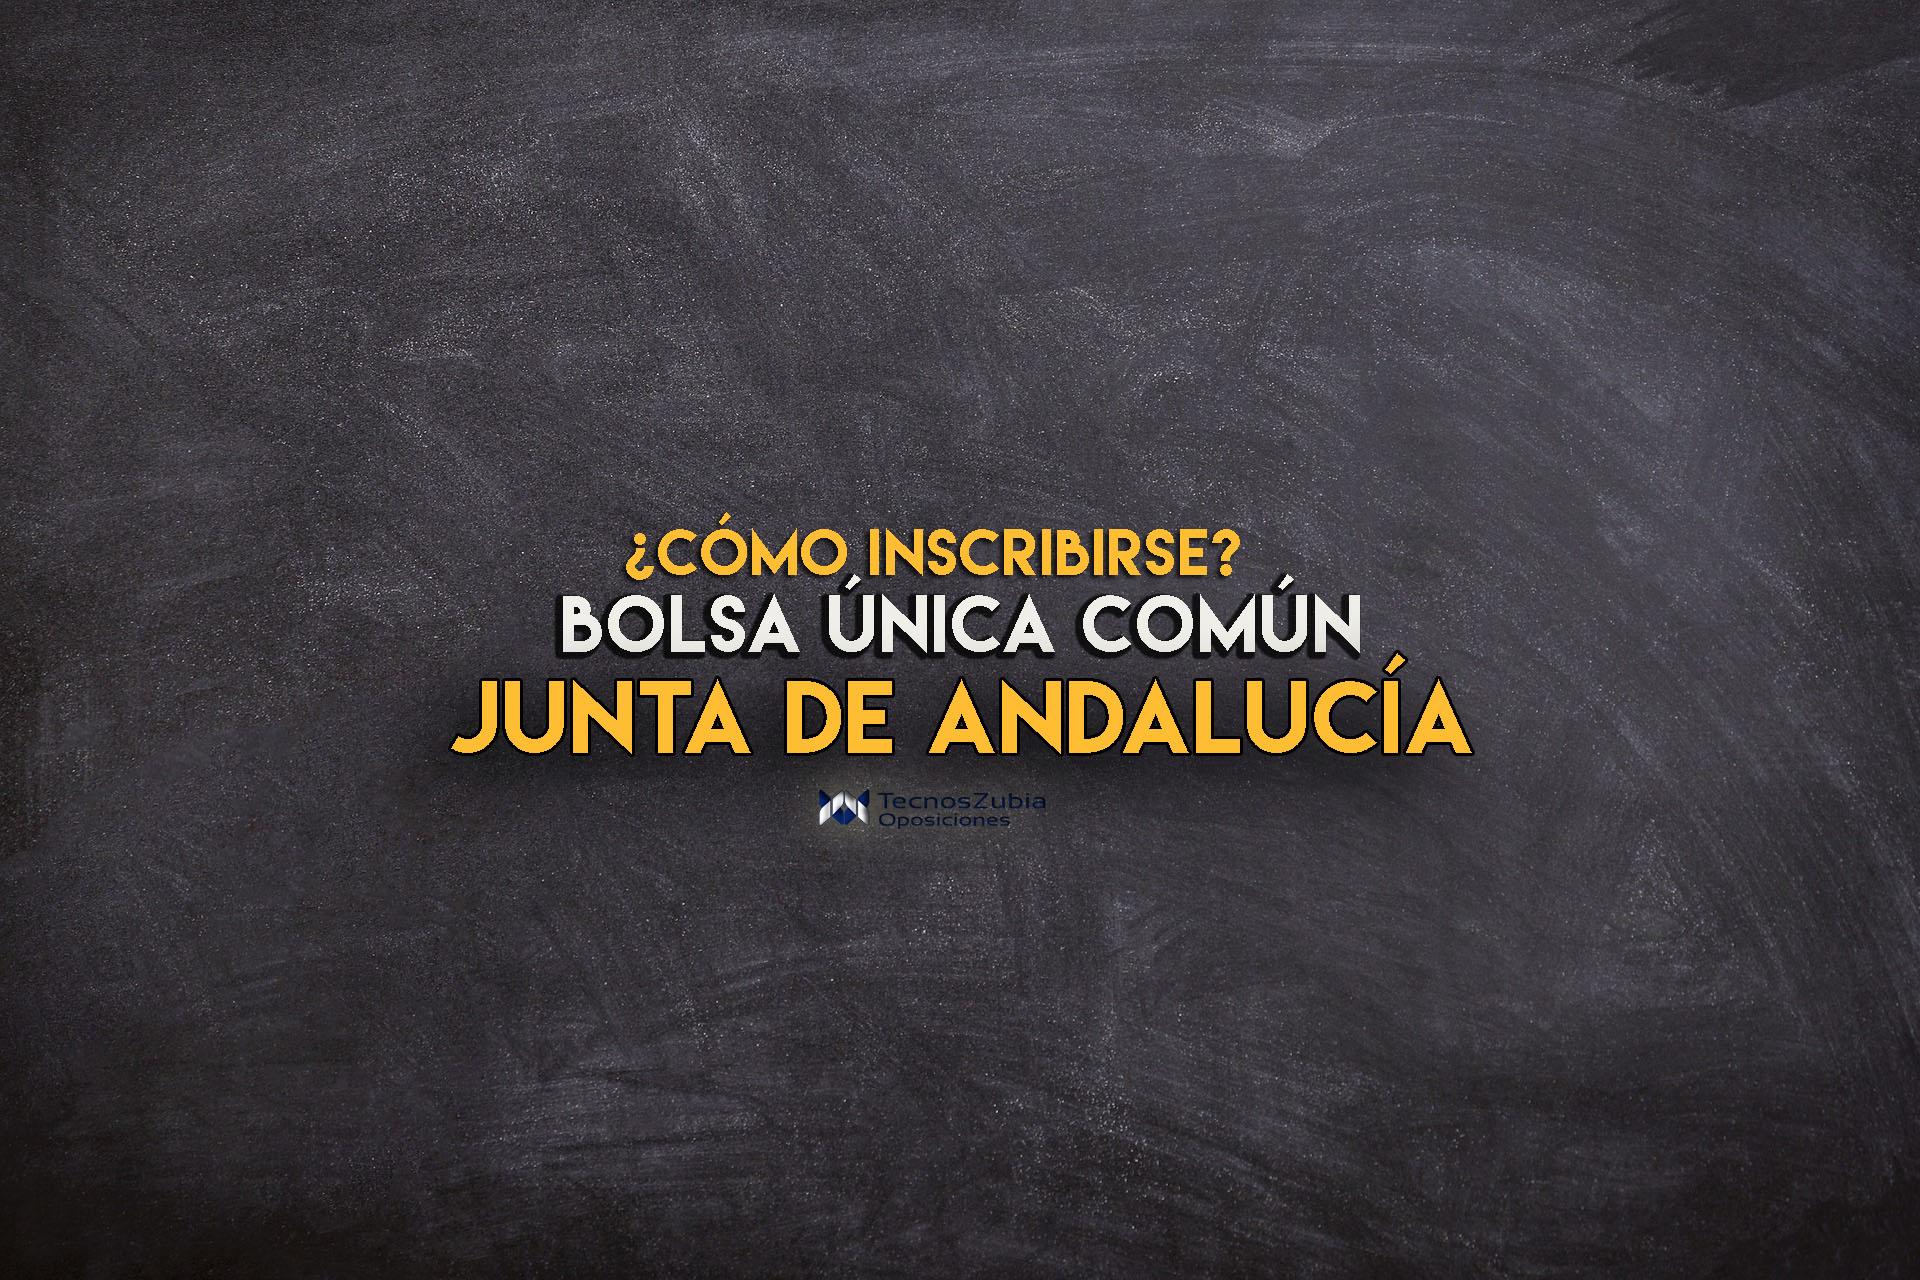 inscripcion bolsa unica comun junta de andalucia